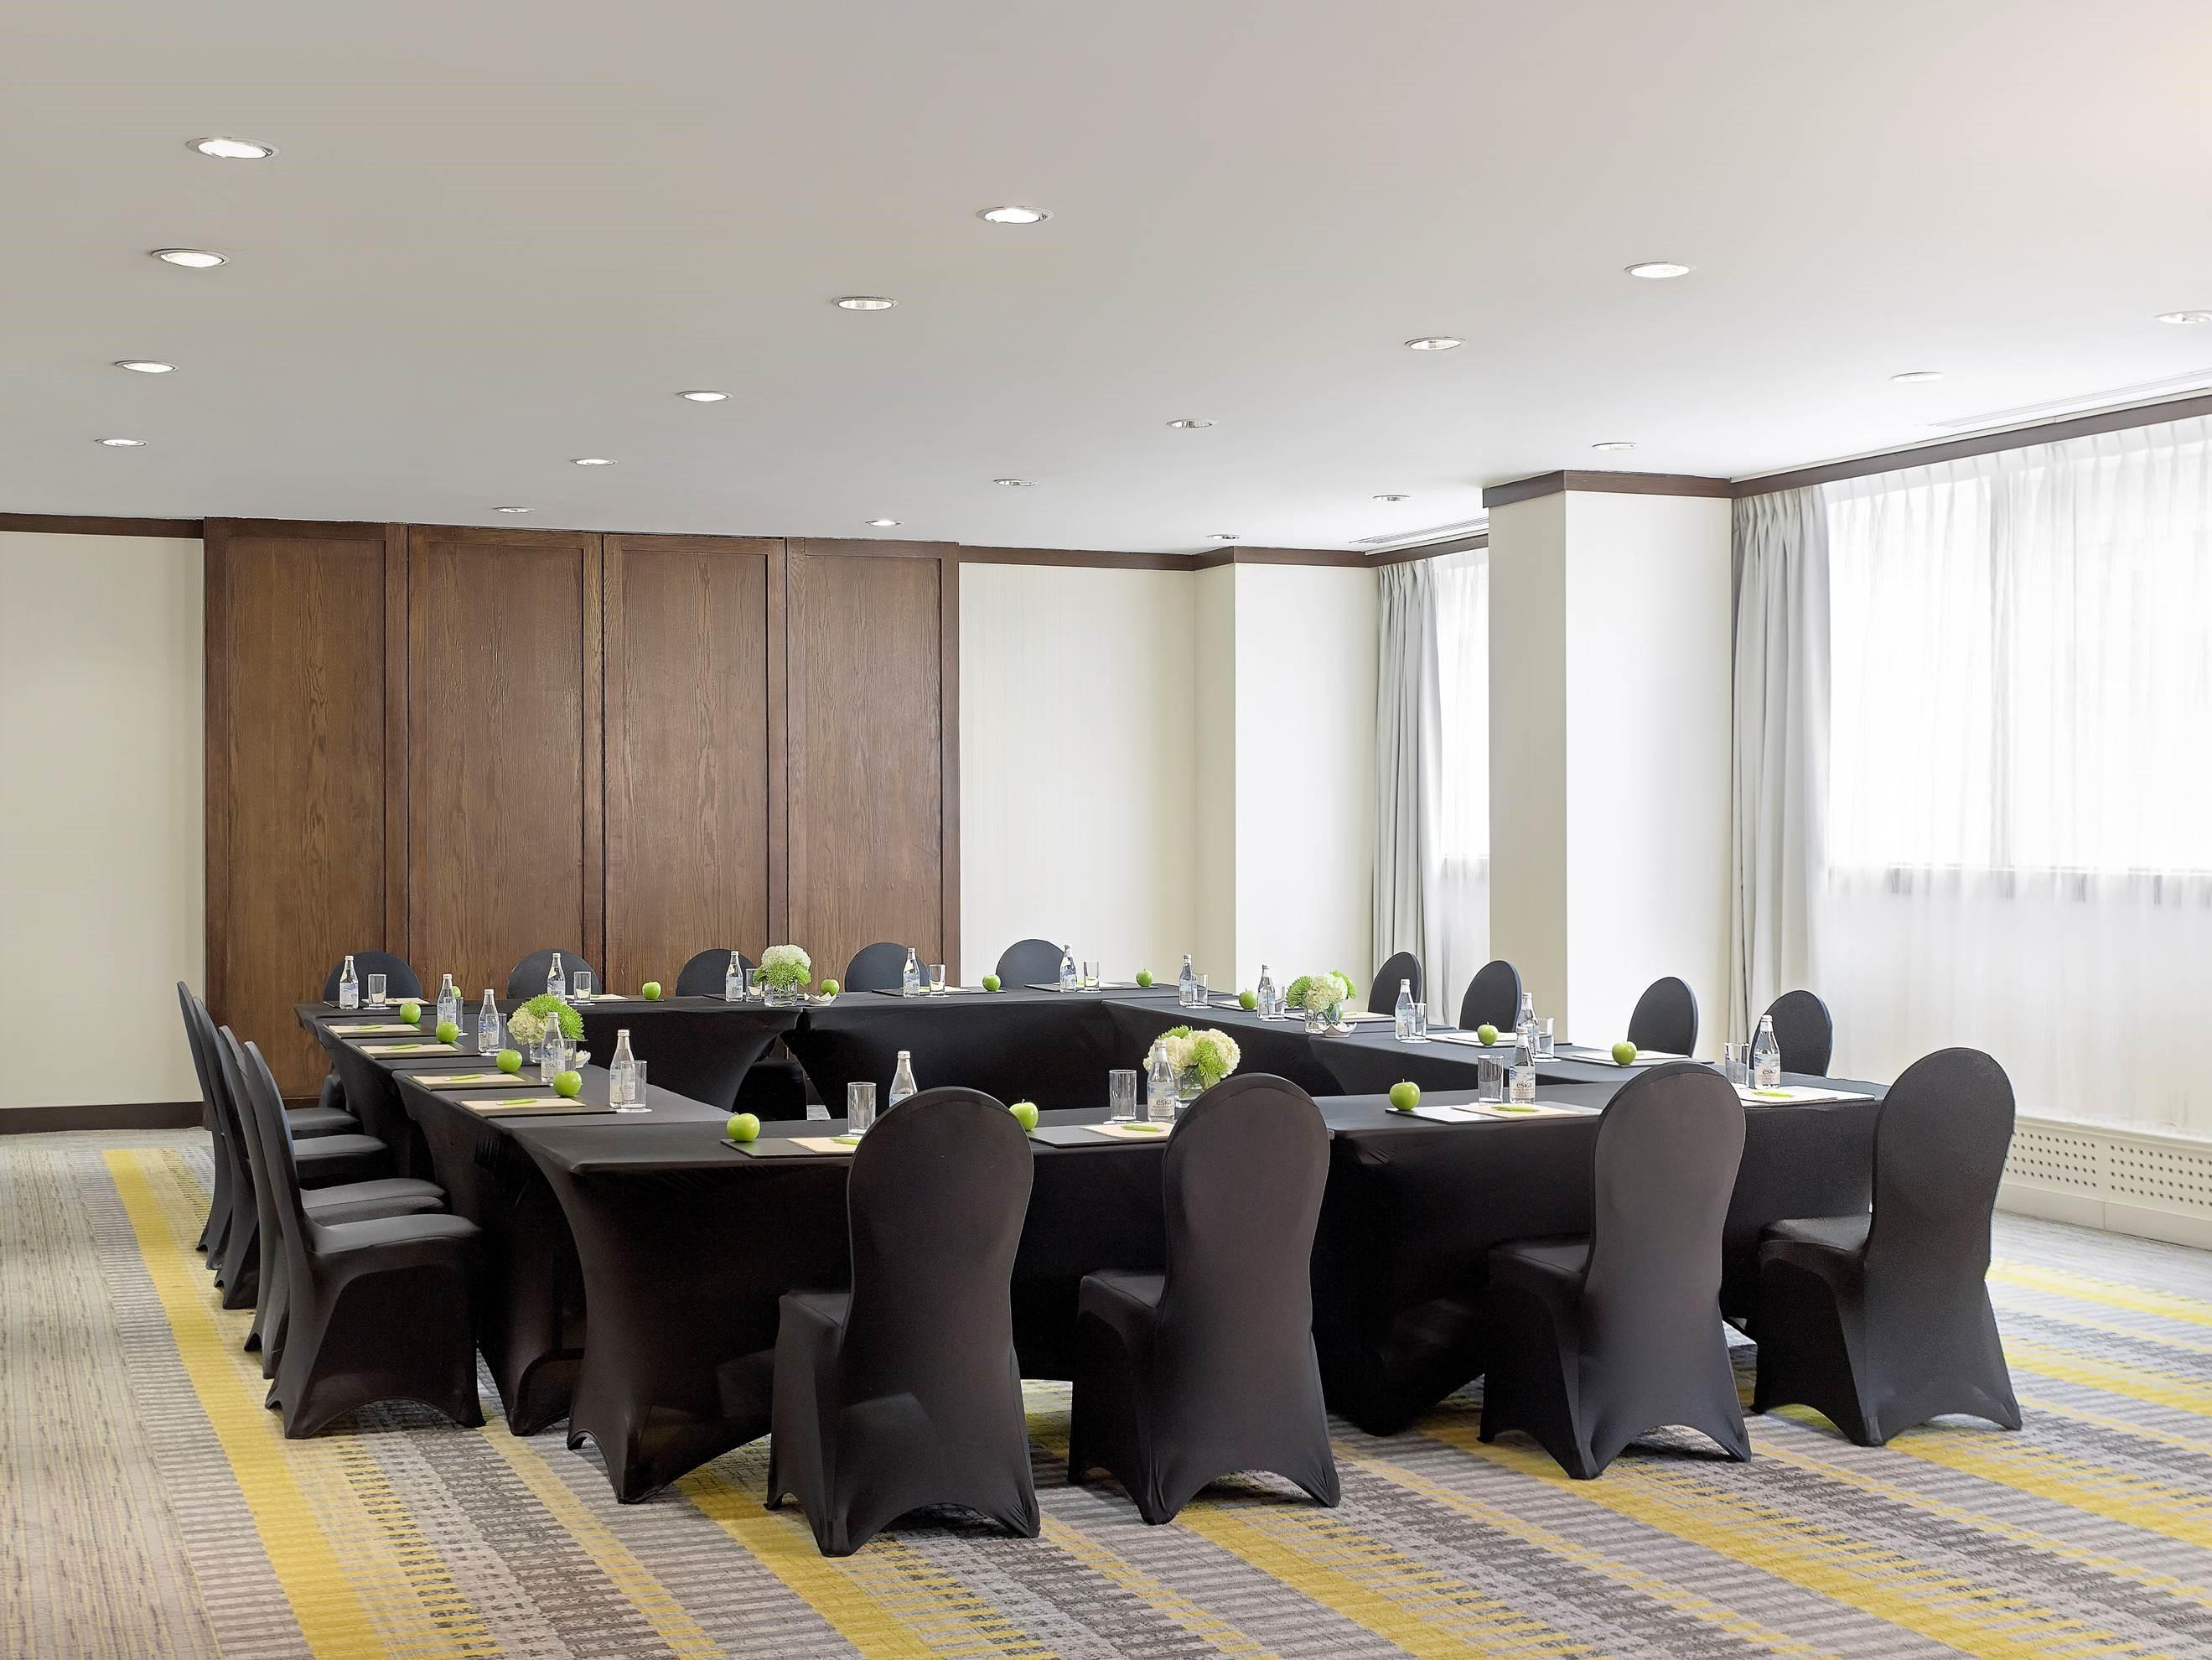 CHELSEA HOTEL, TORONTO in Toronto: Carlyle Room